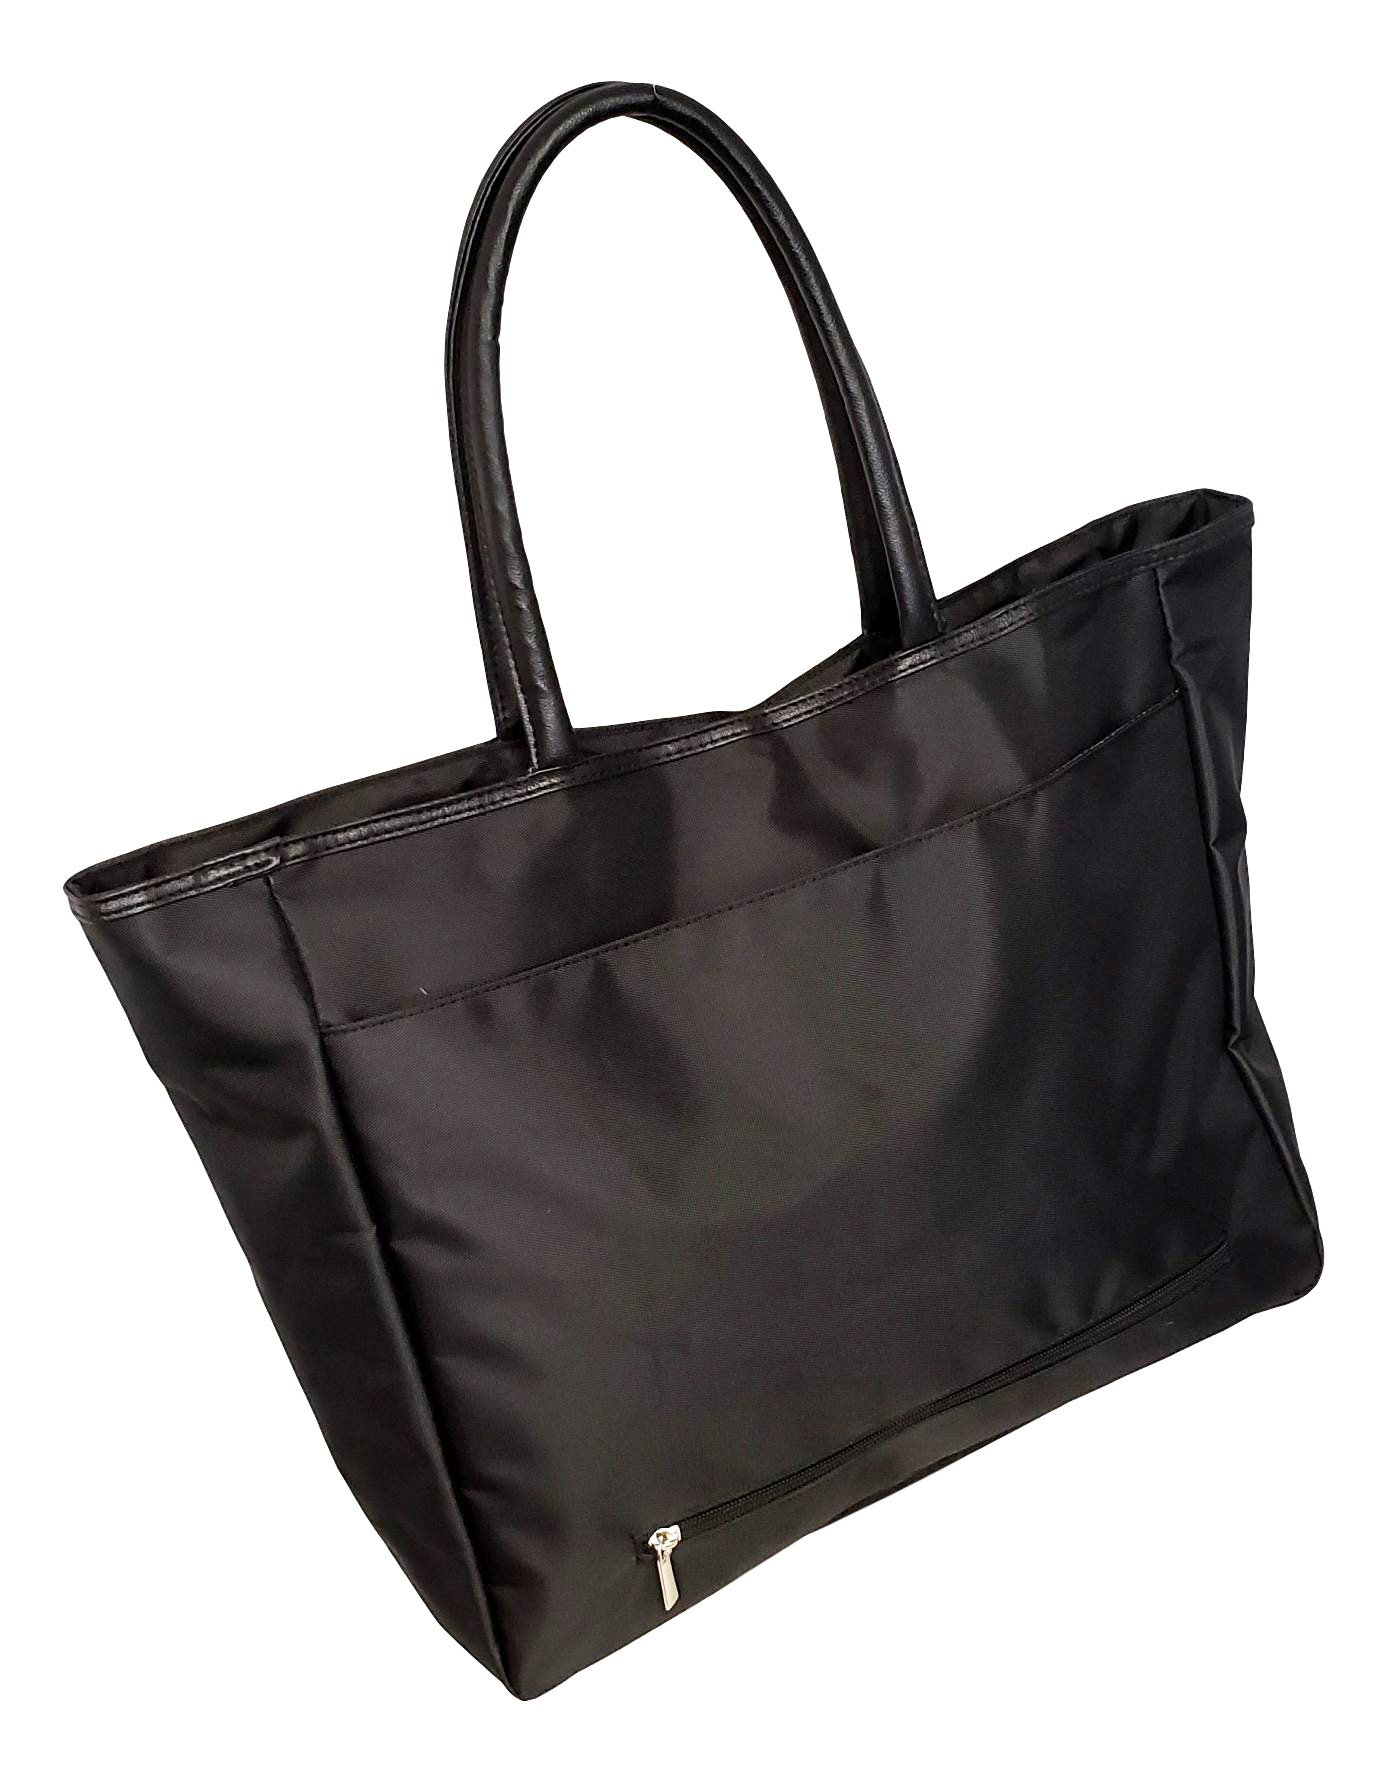 Large Black Organizing Travel Companion Purse Handbag Bag (No Embroidery - Black) by Sona G Designs (Image #1)